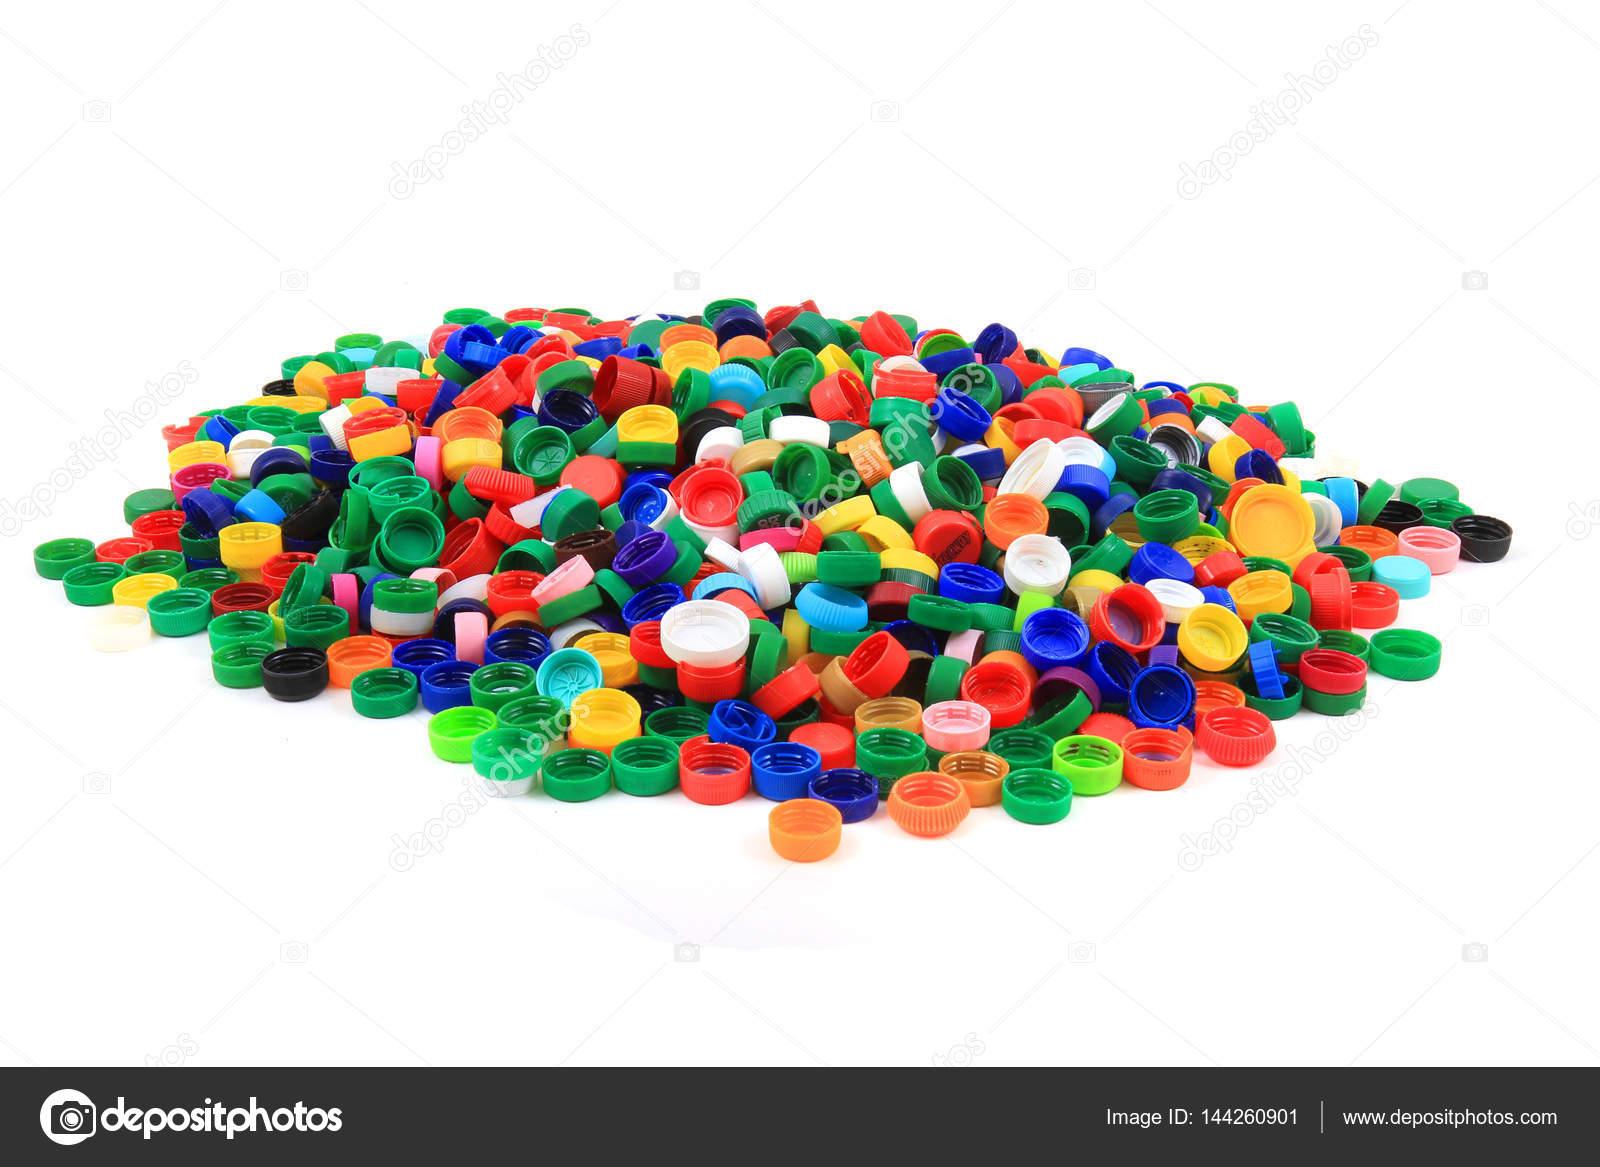 Tapas de pet pl stico aisladas foto de stock jonnysek for Tapas de plastico